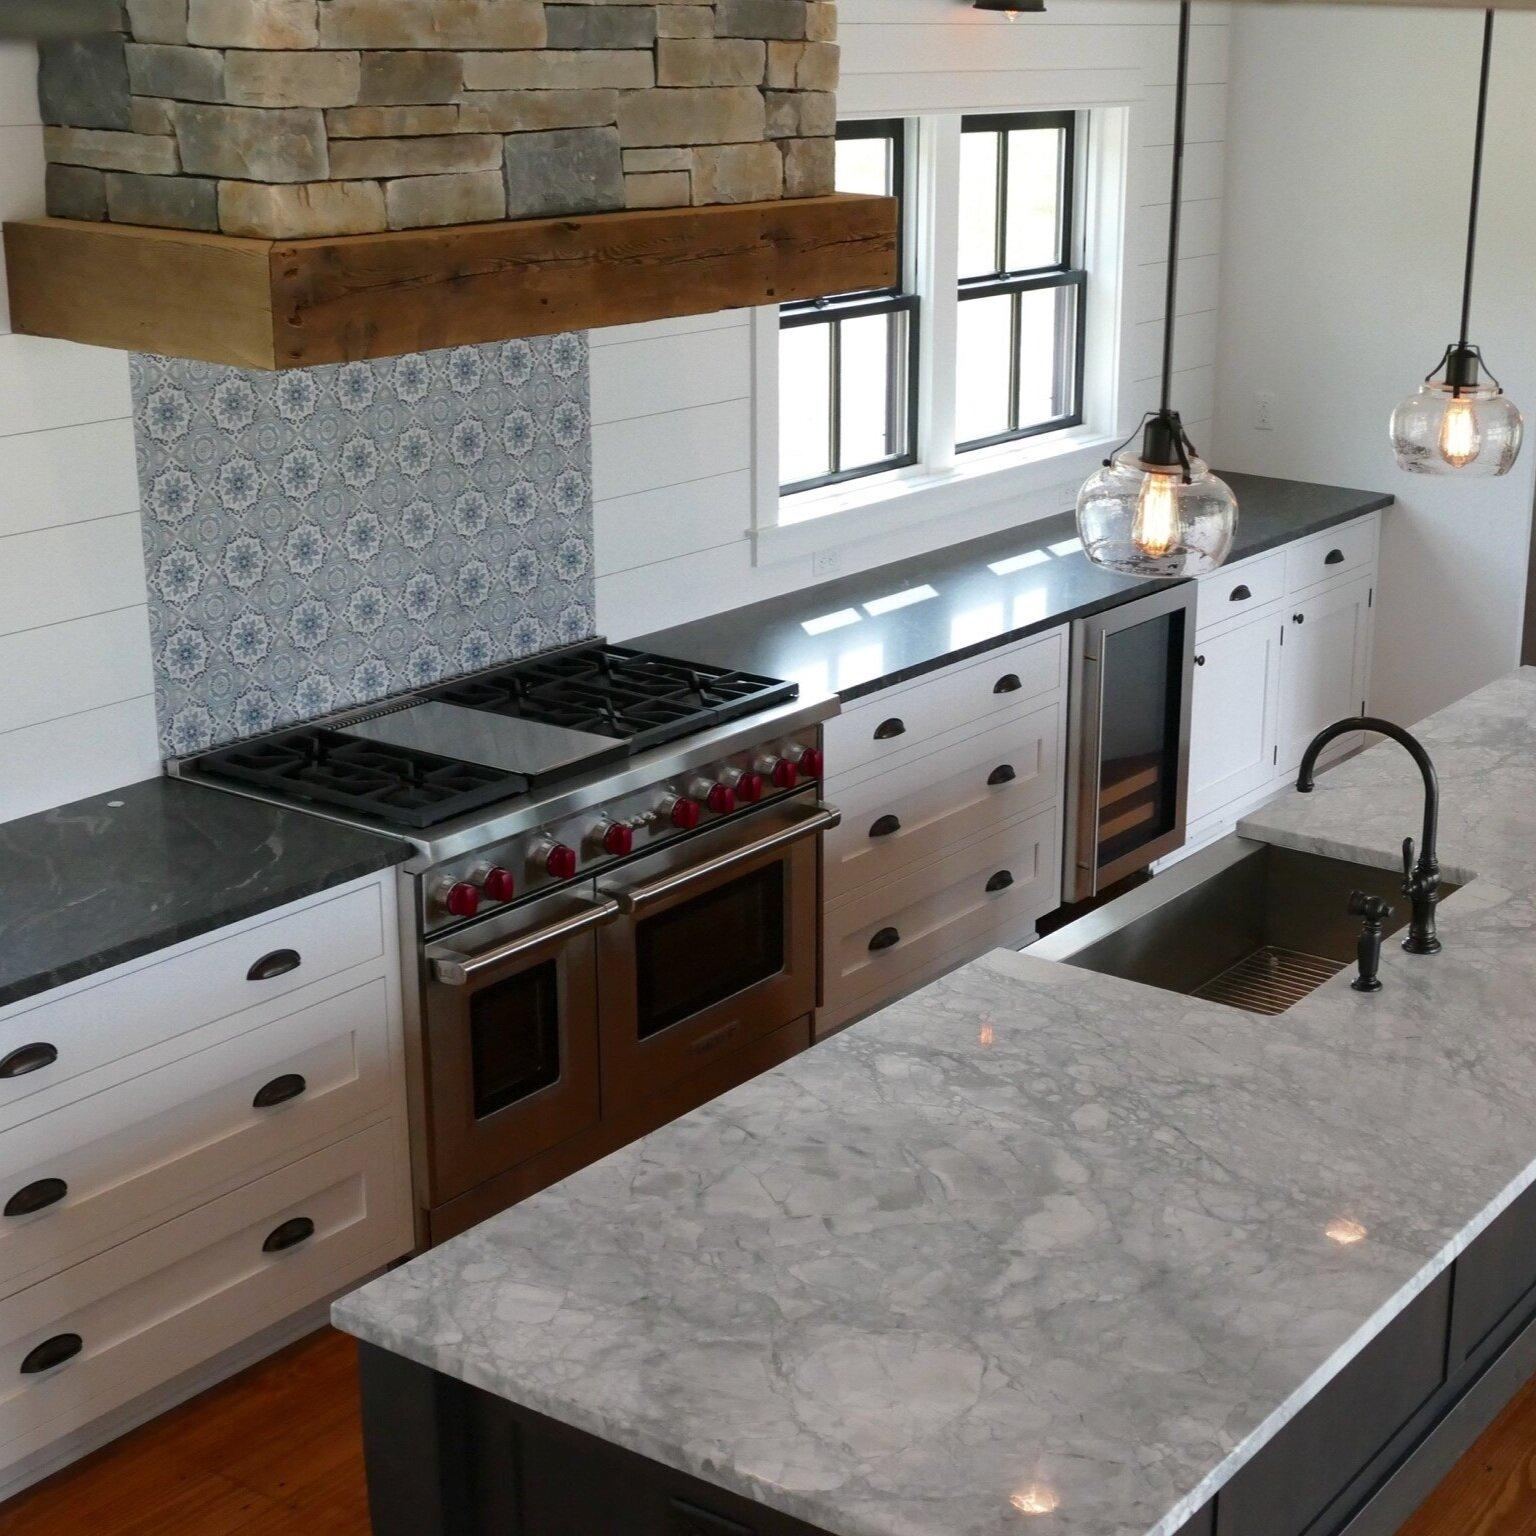 Apuzzo Kitchens Custom Cabinetry & Design